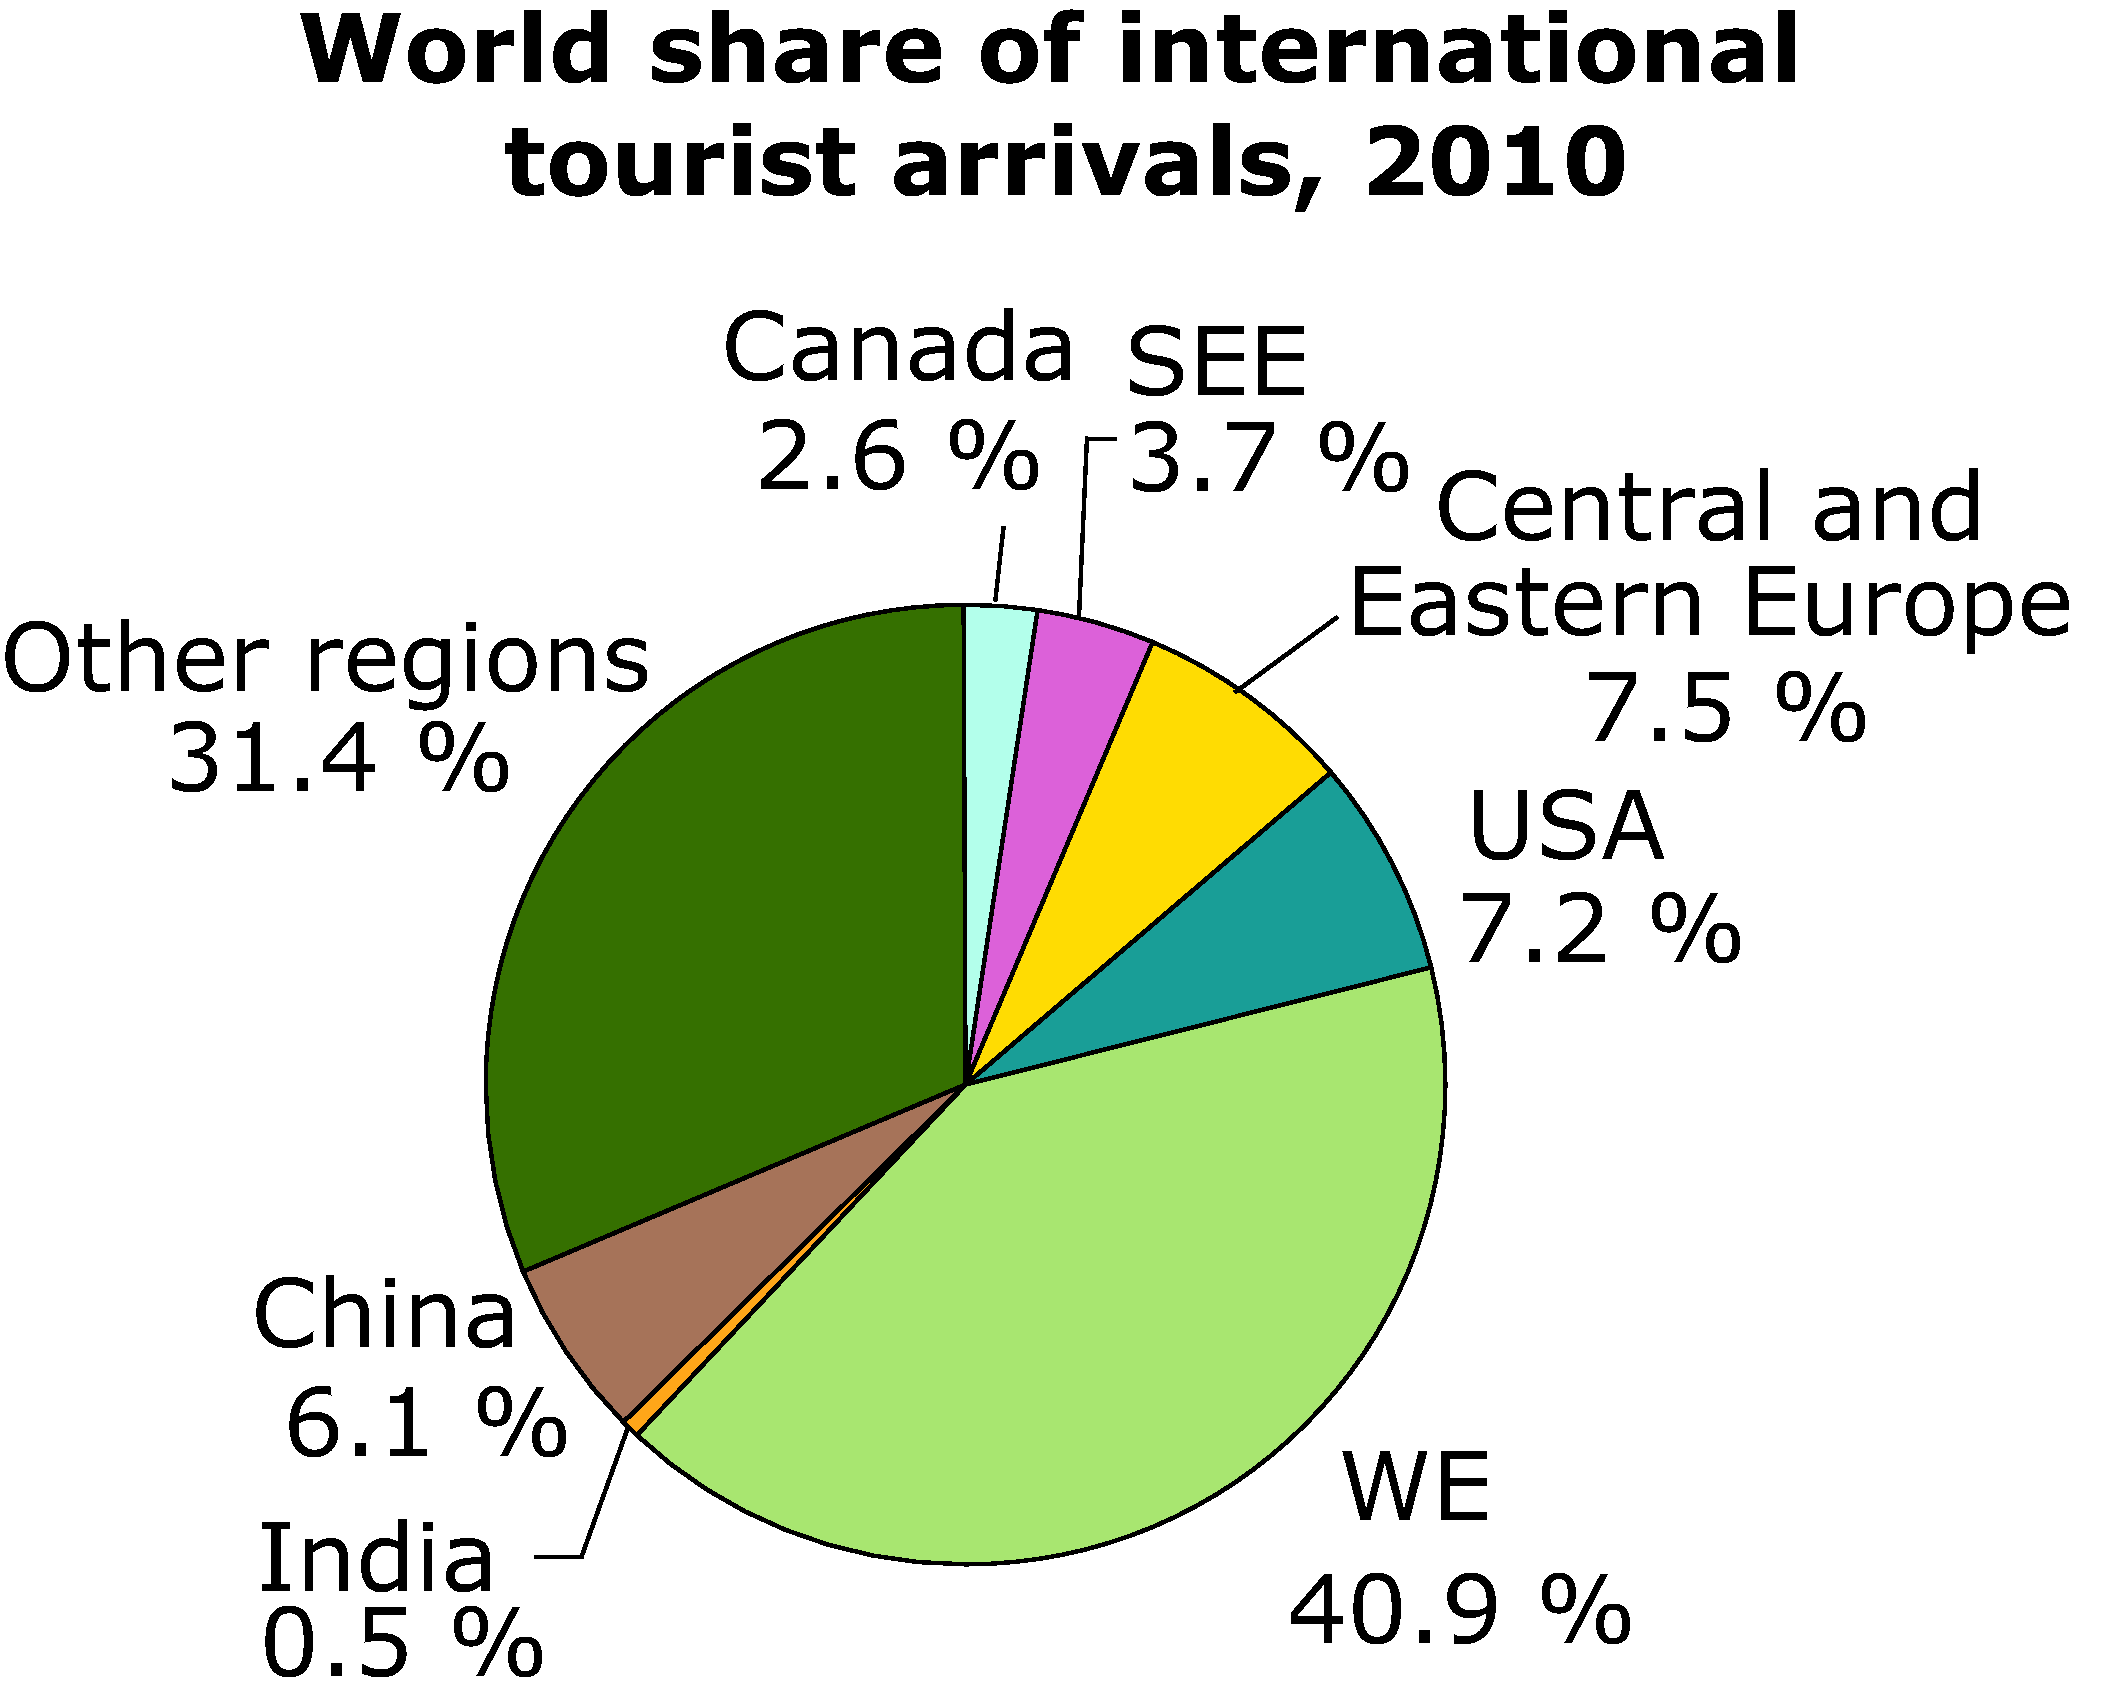 World share of international tourist arrivals, 2010